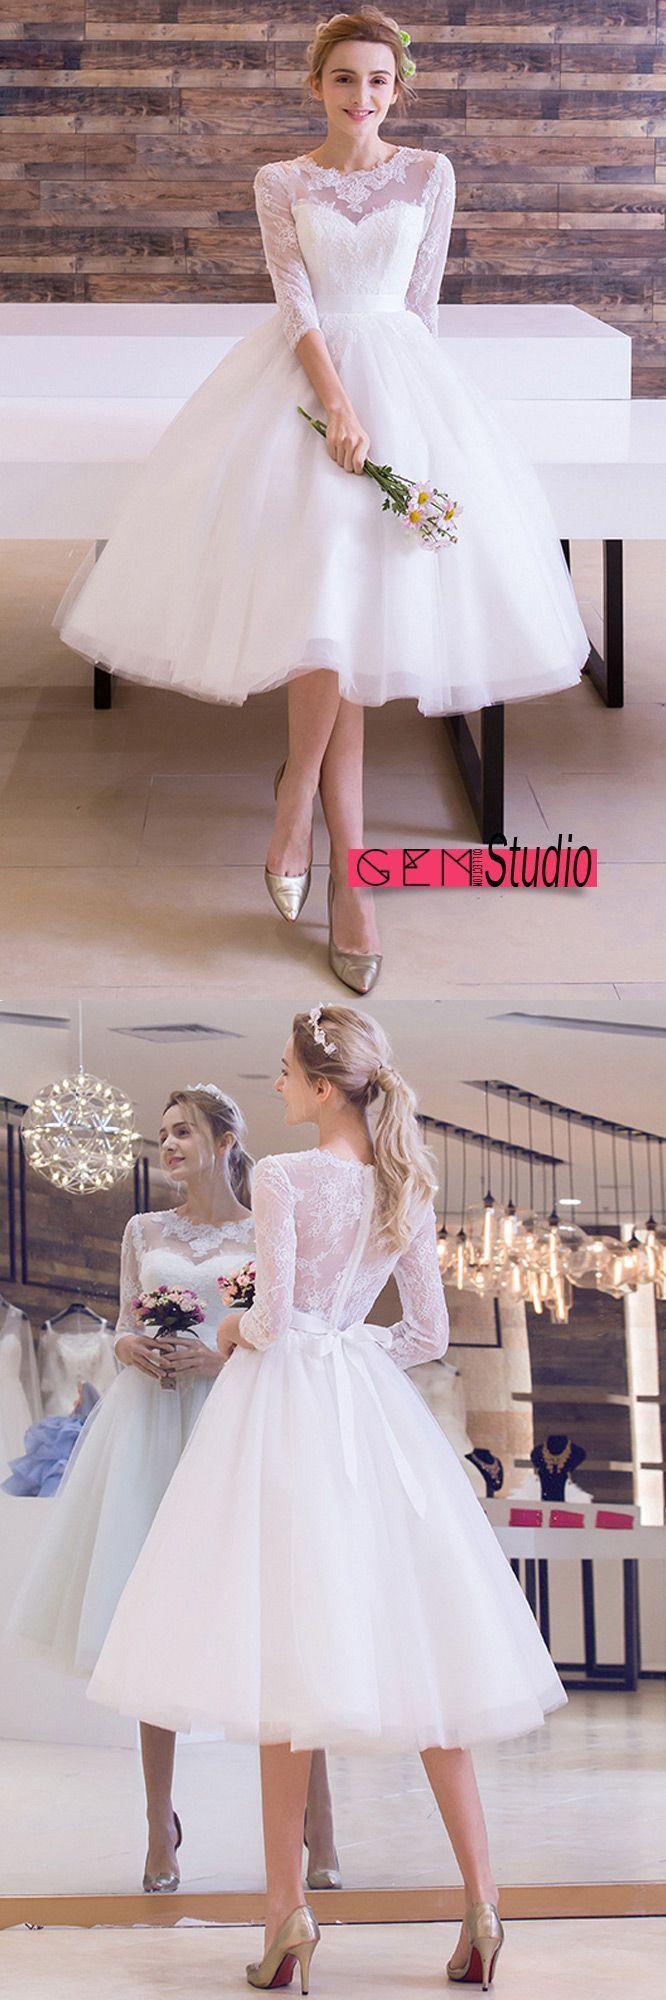 Vintage tealength wedding dress aline scoop neck tulle with